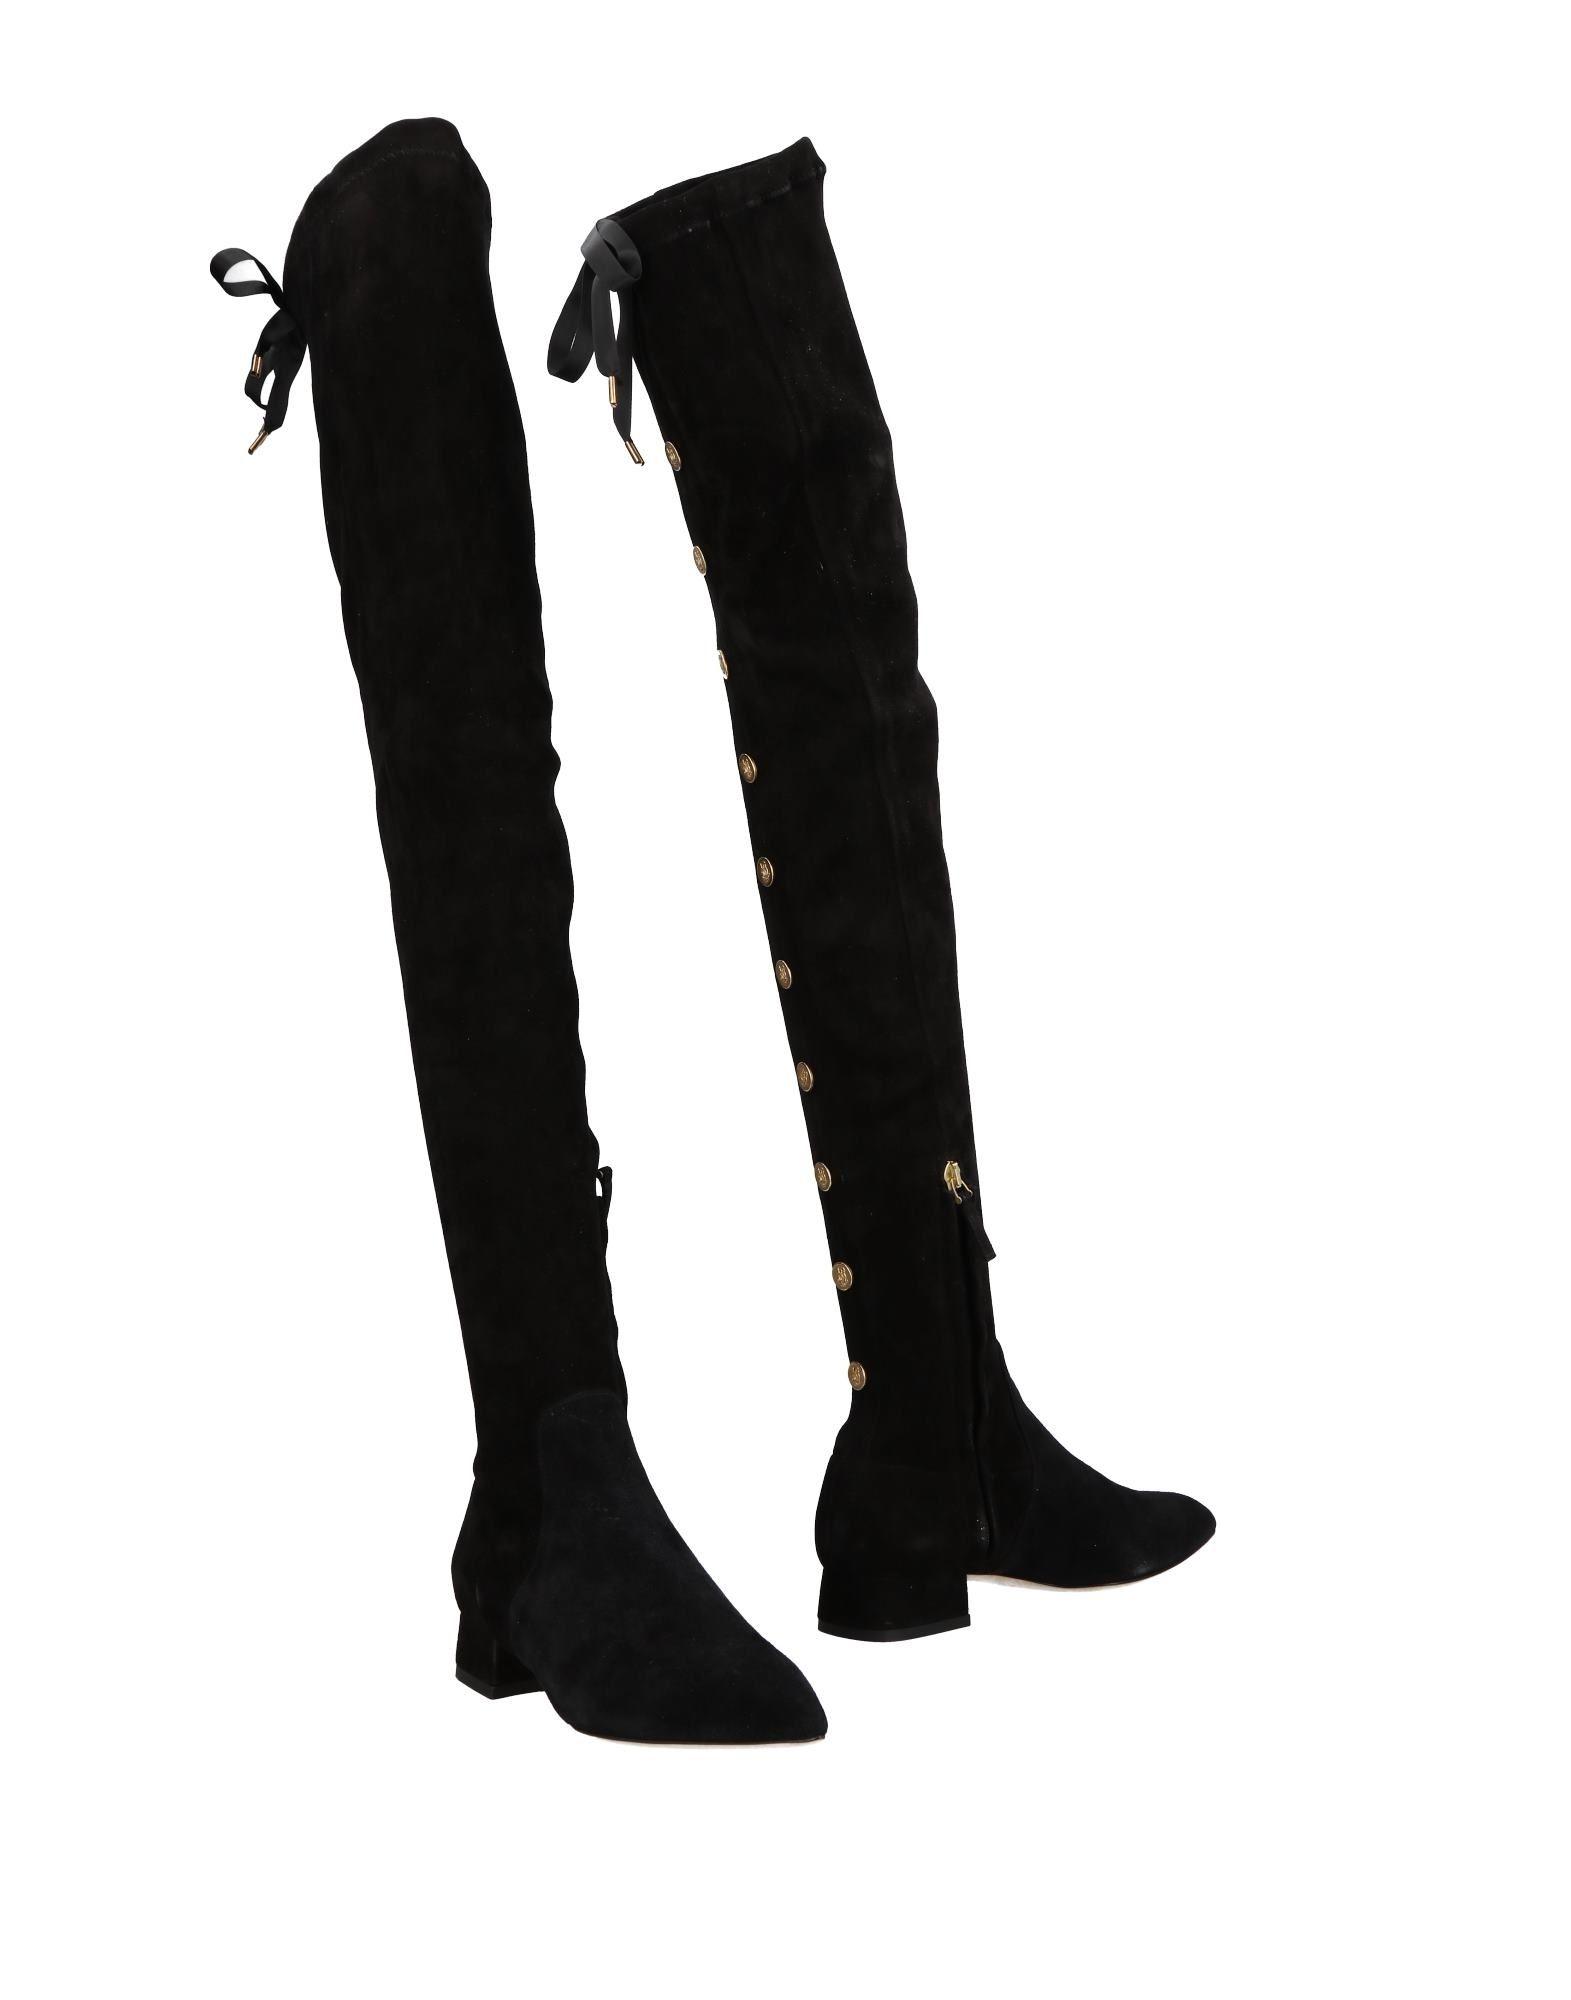 Olgana Paris Boots - Women Olgana Paris Boots online on 11502713OE  United Kingdom - 11502713OE on 1558cf